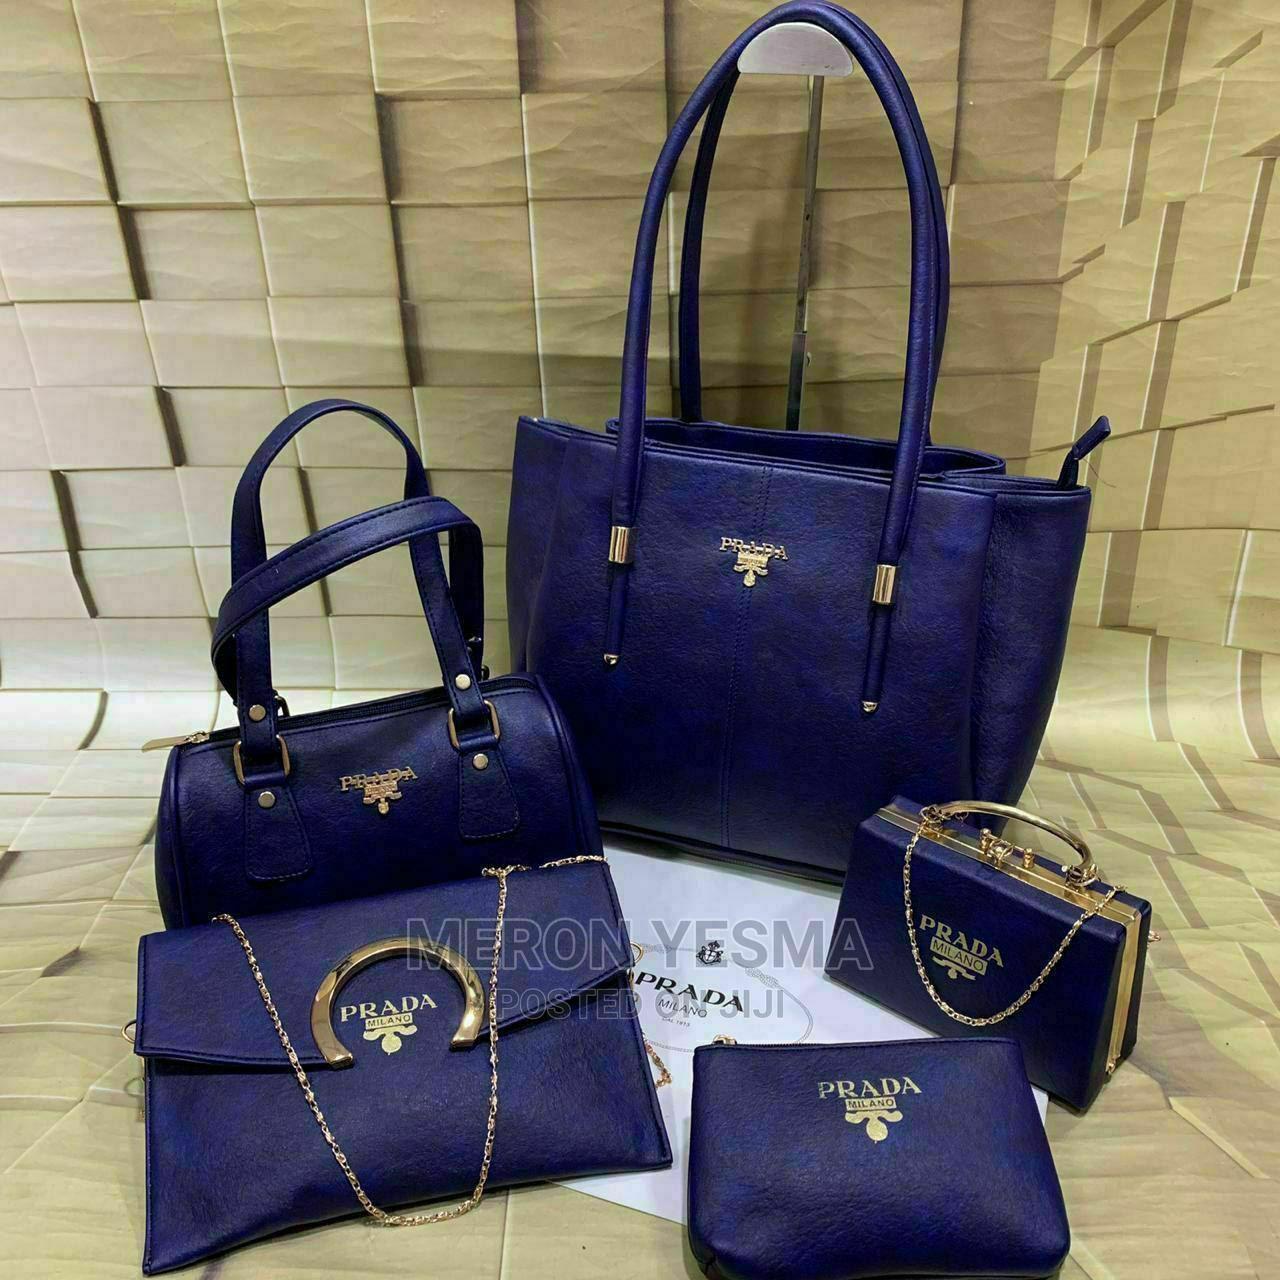 Prada 5 in 1 Ladies Bag   Bags for sale in Nifas Silk-Lafto, Addis Ababa, Ethiopia